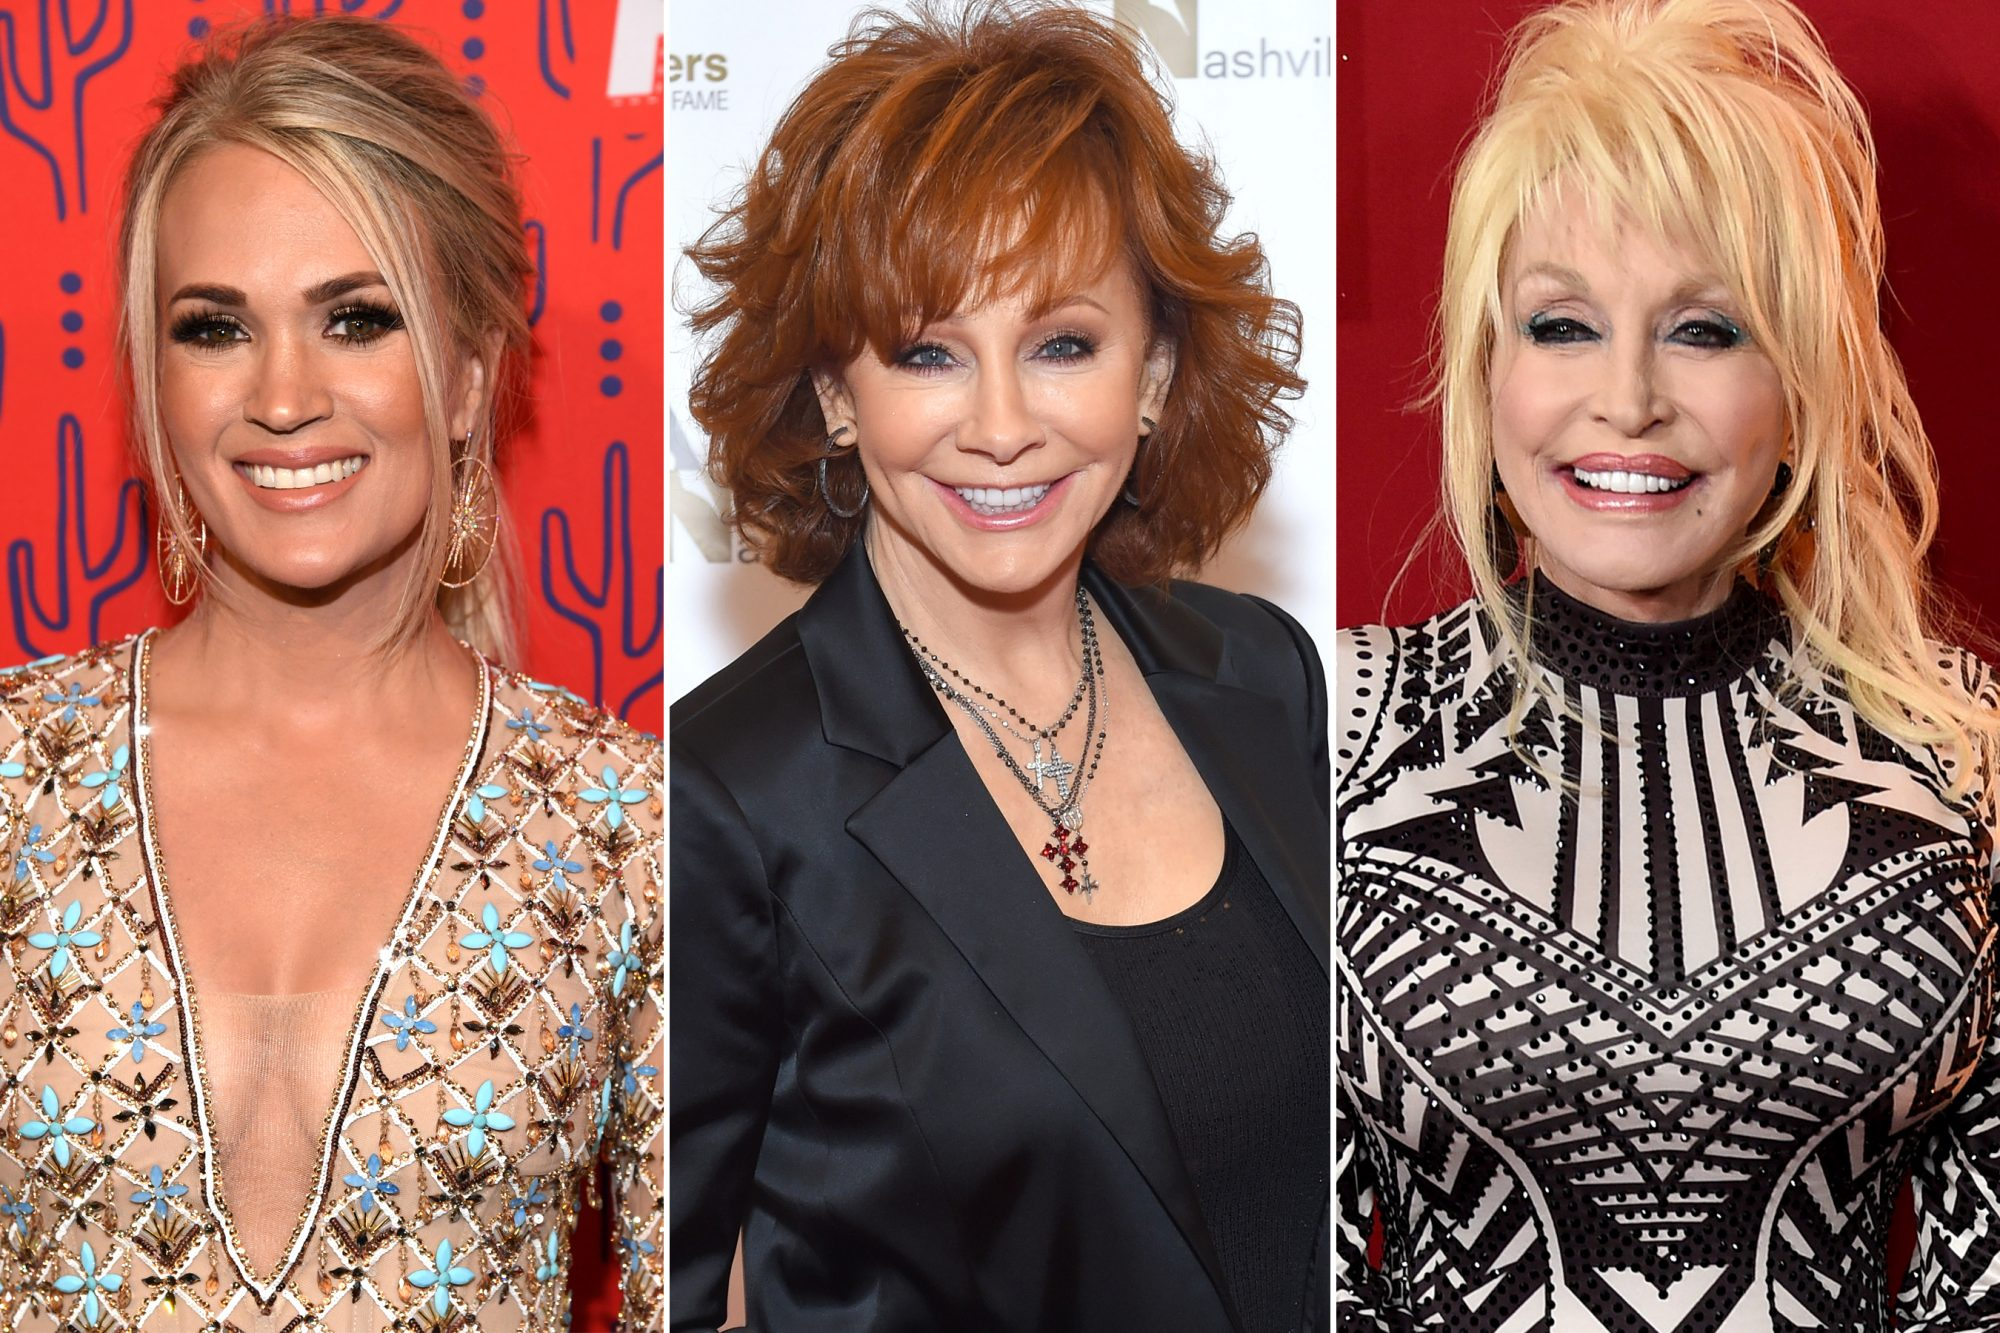 Carrie Underwood; Reba McEntire; Dolly Parton